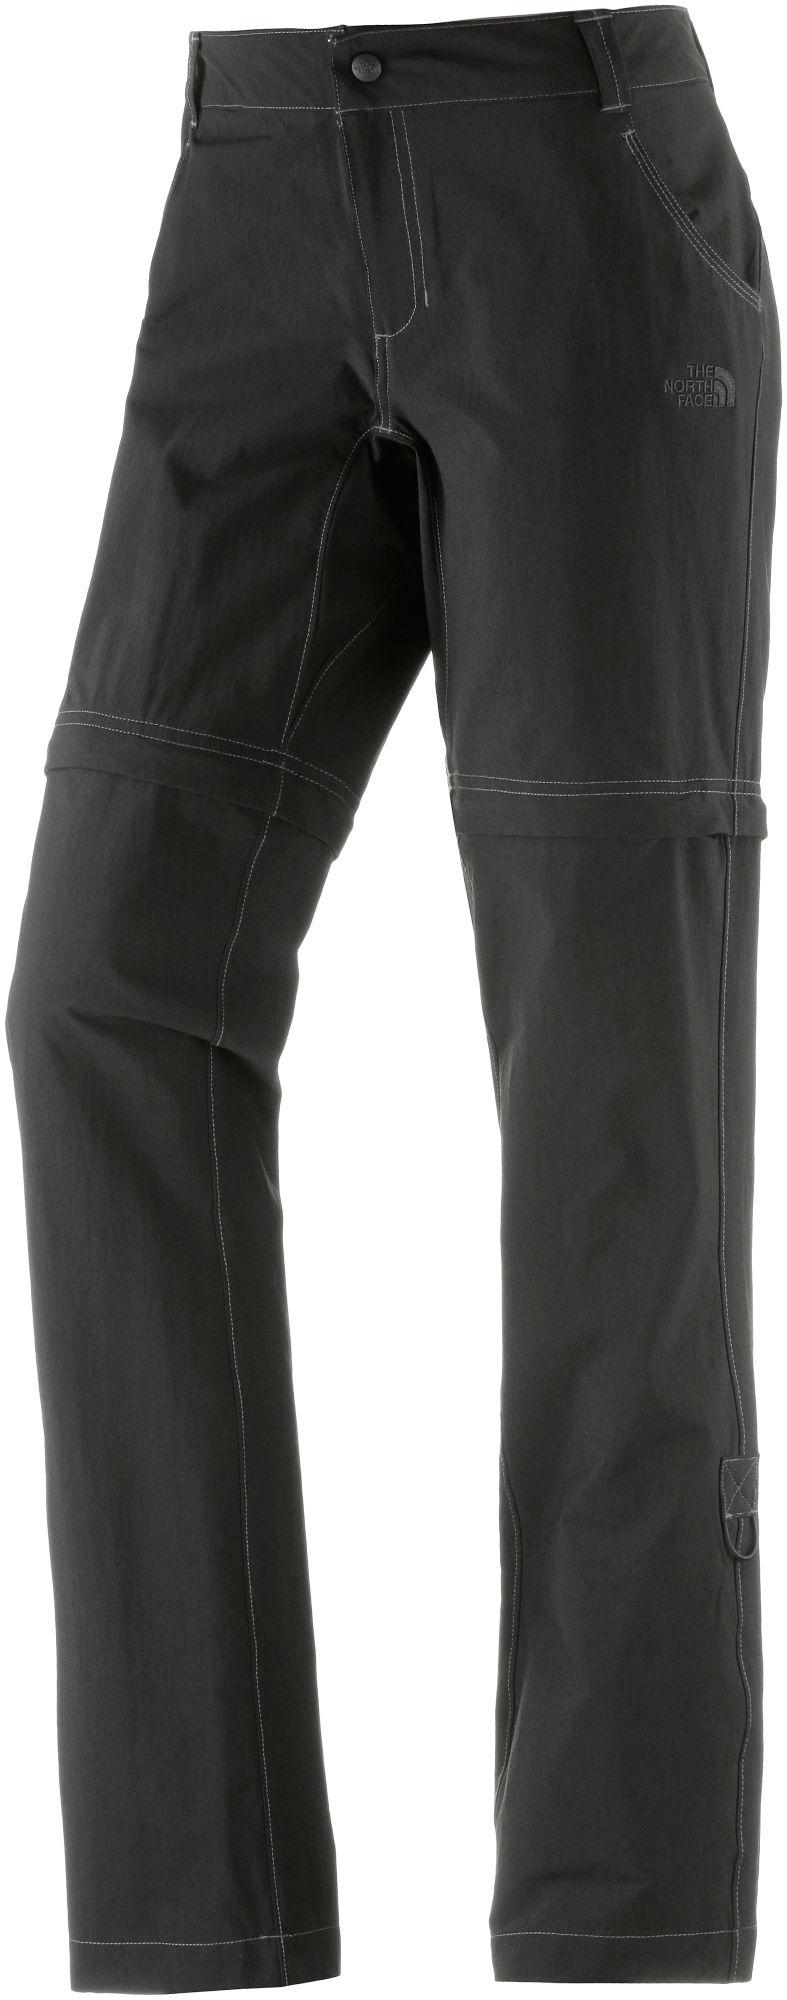 Exploration Convertible Zipphose Damen in schwarz, Größe 34